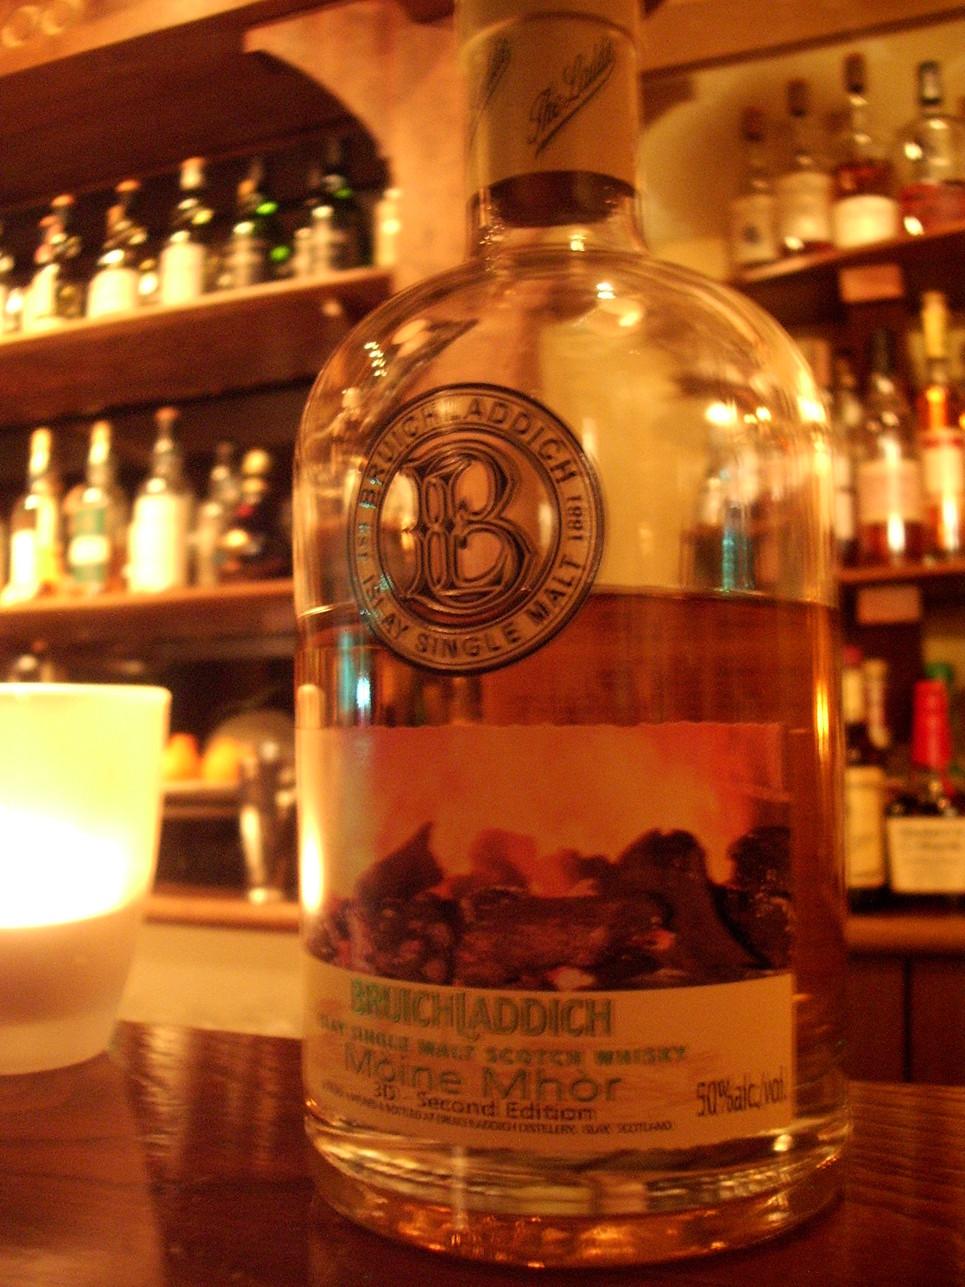 Bar Waterloo name=